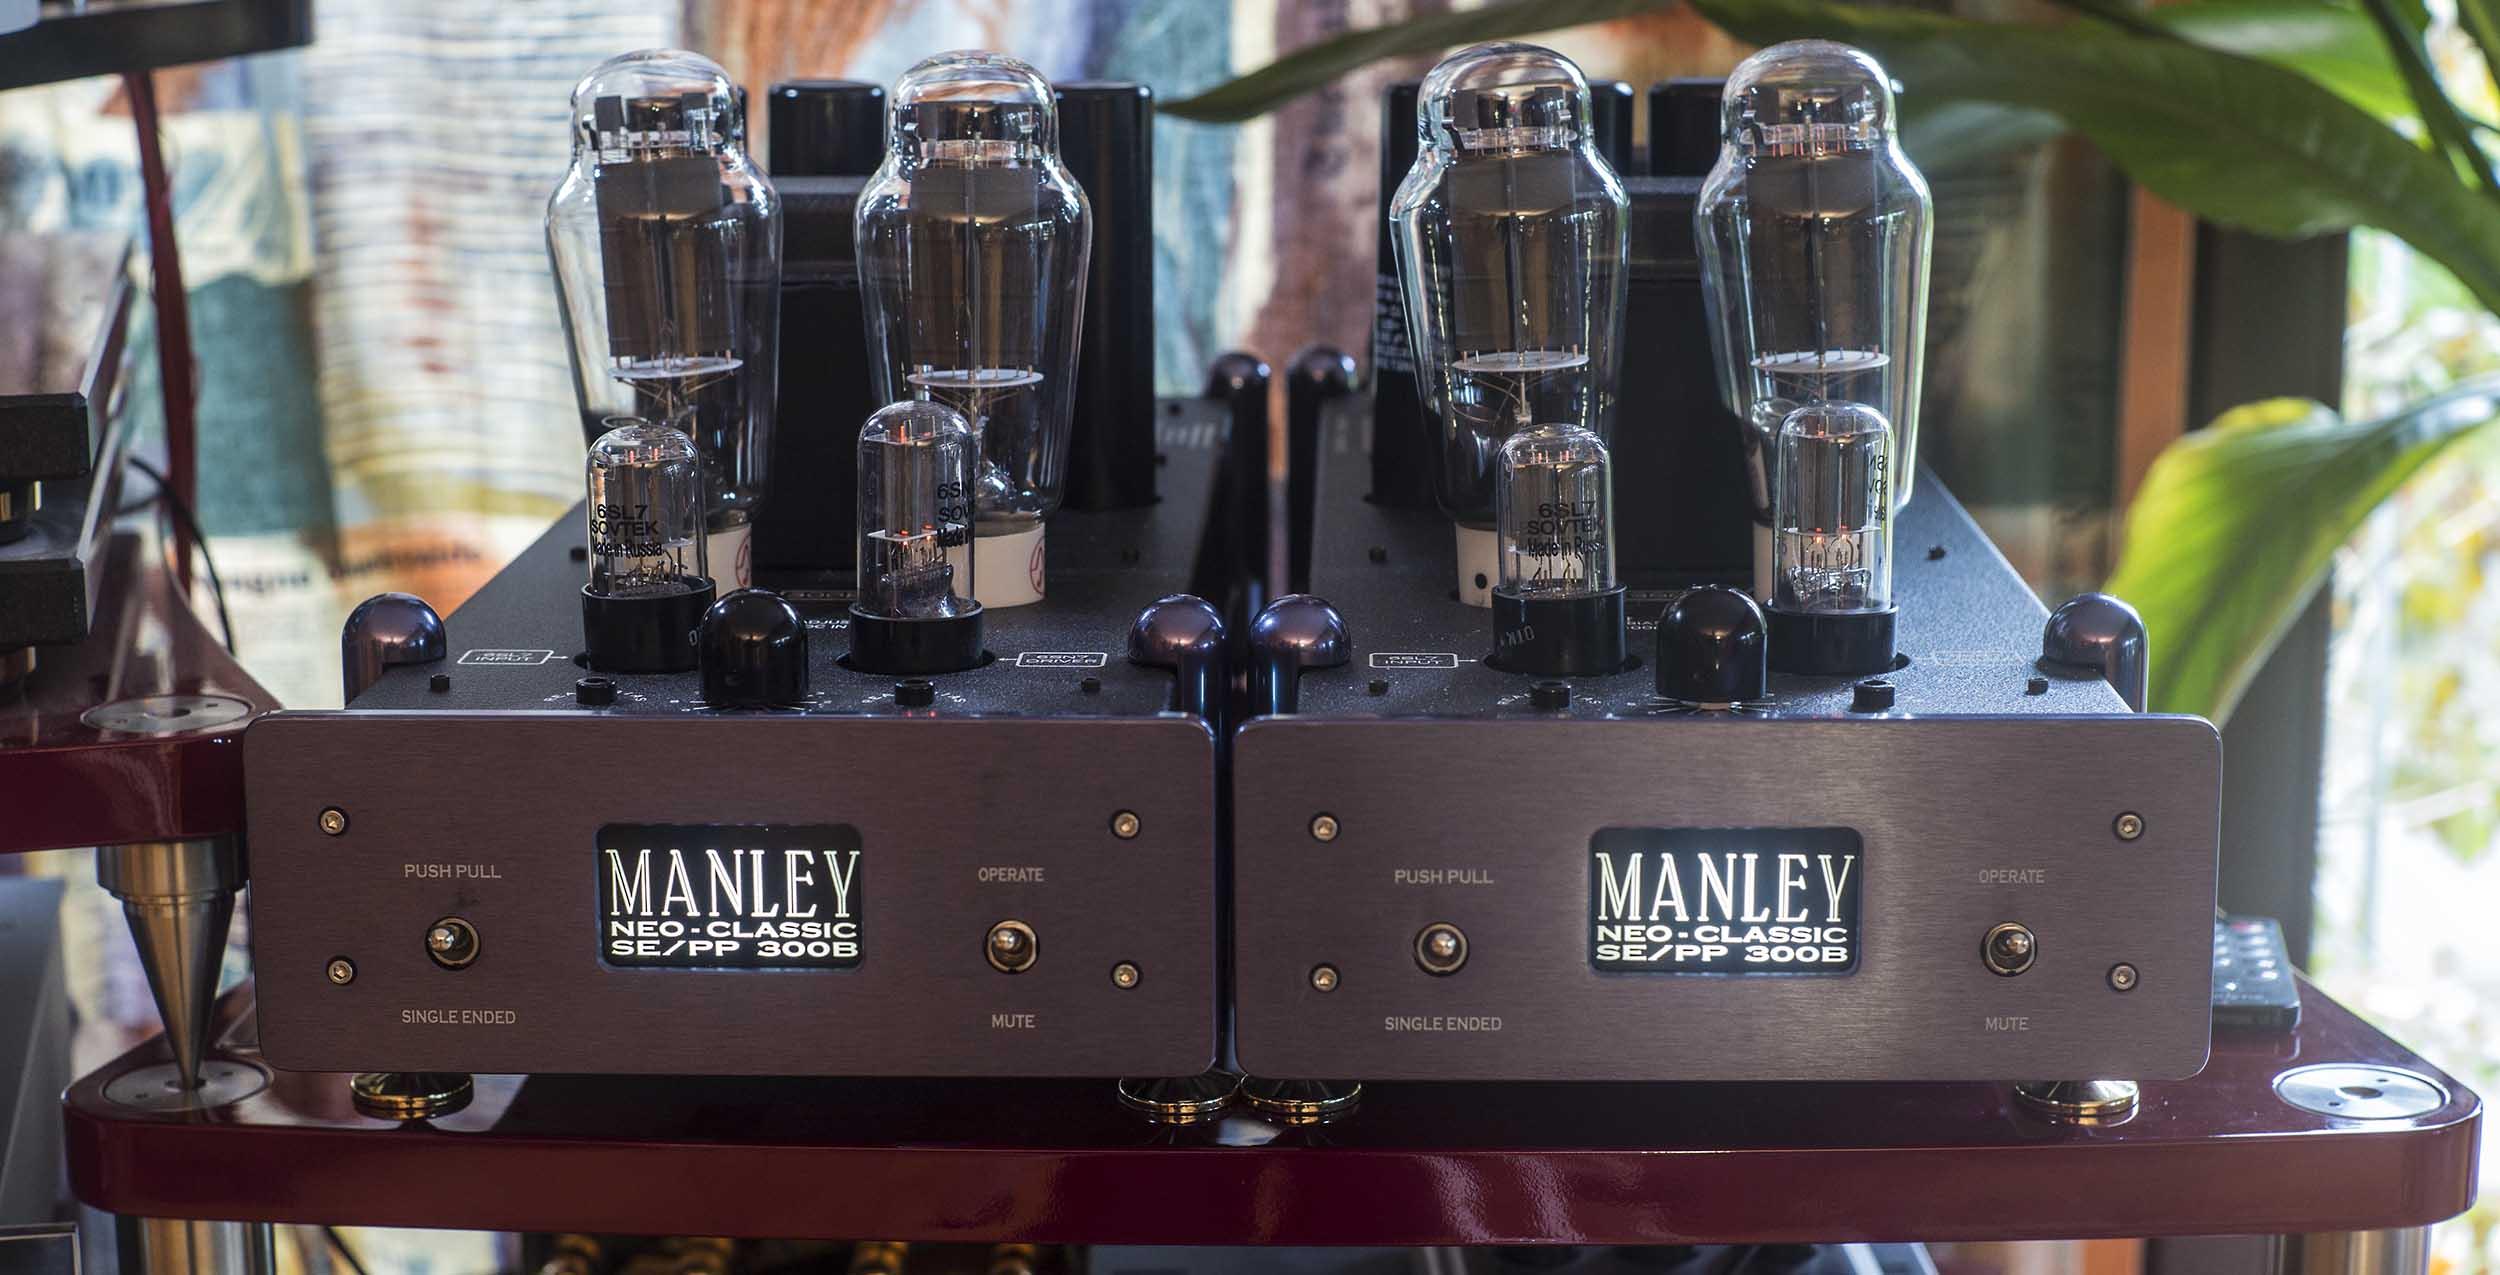 Manley Neoclassic SEPP